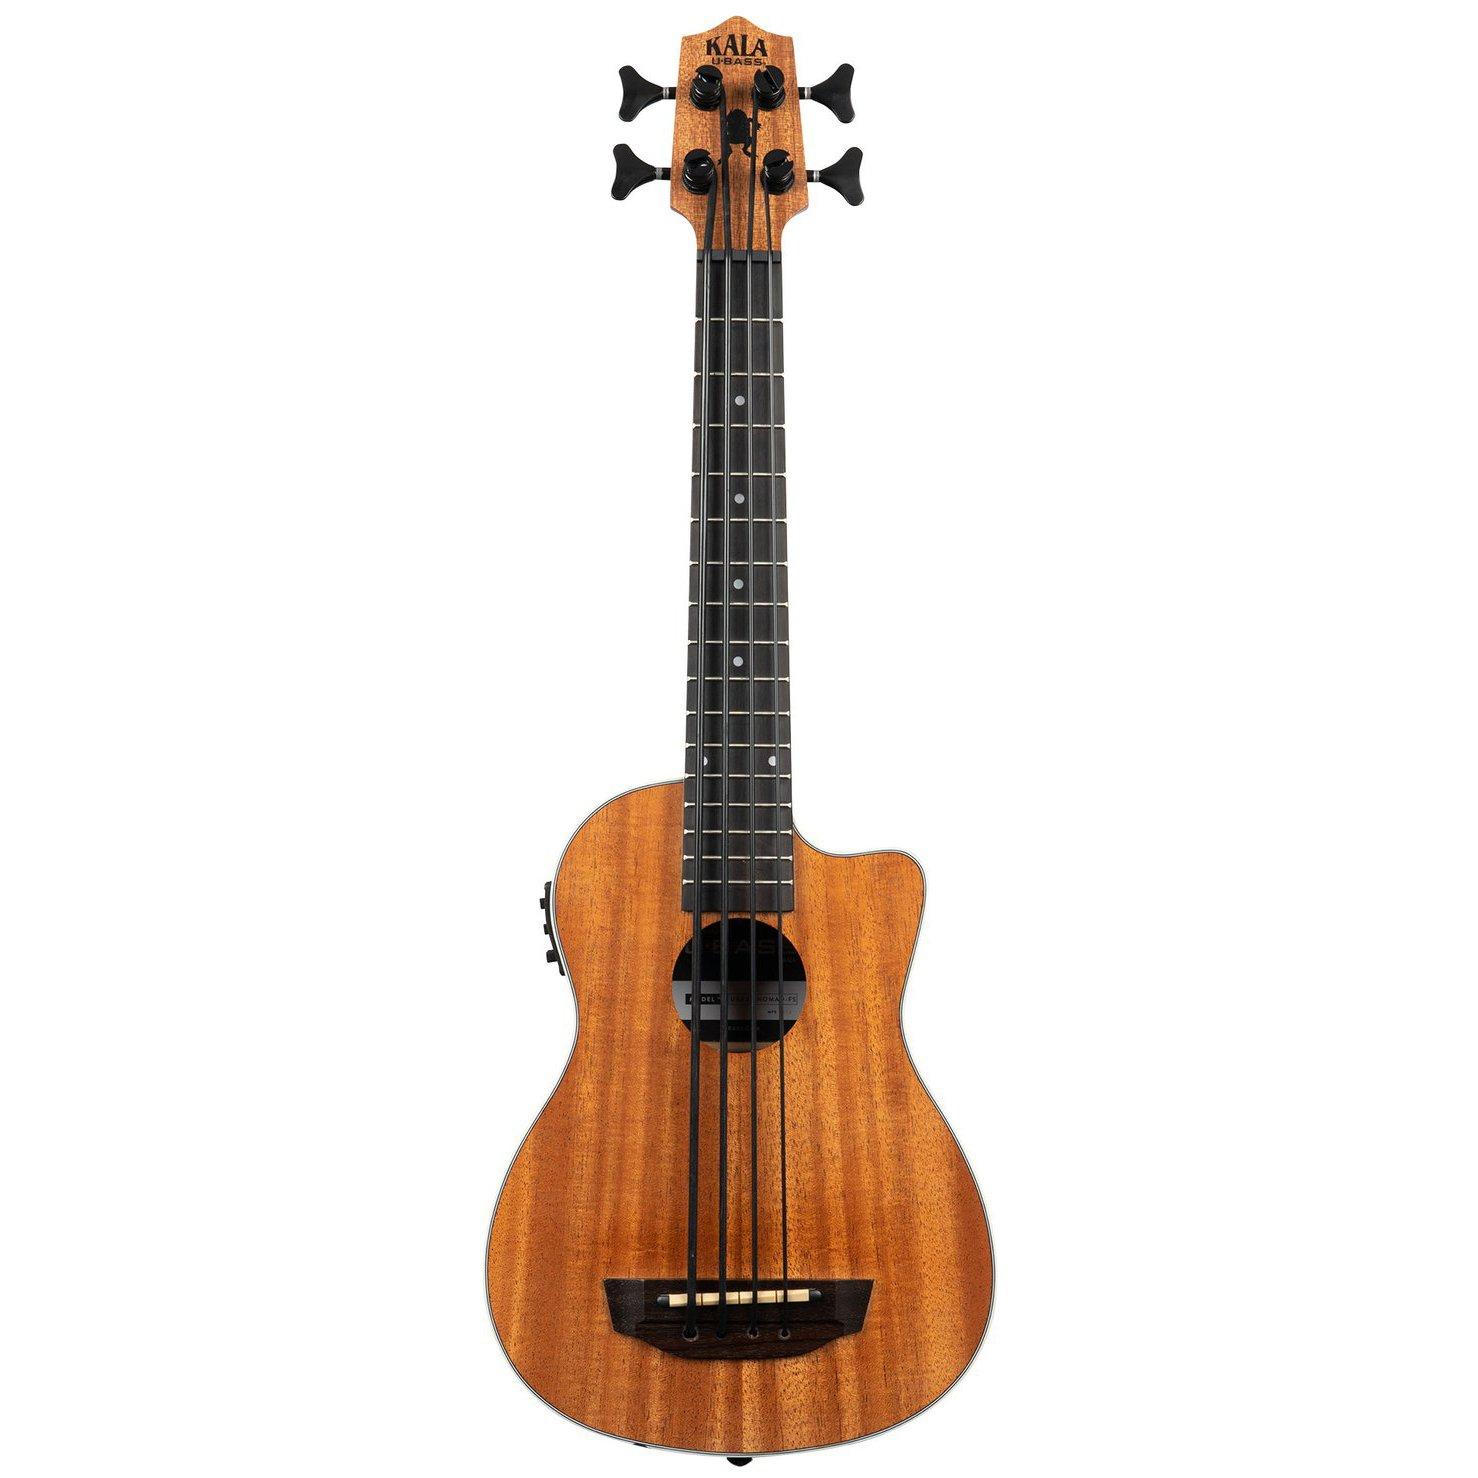 Kala Scout Mahogany Acoustic-Electric U-BASS w/ Cutaway